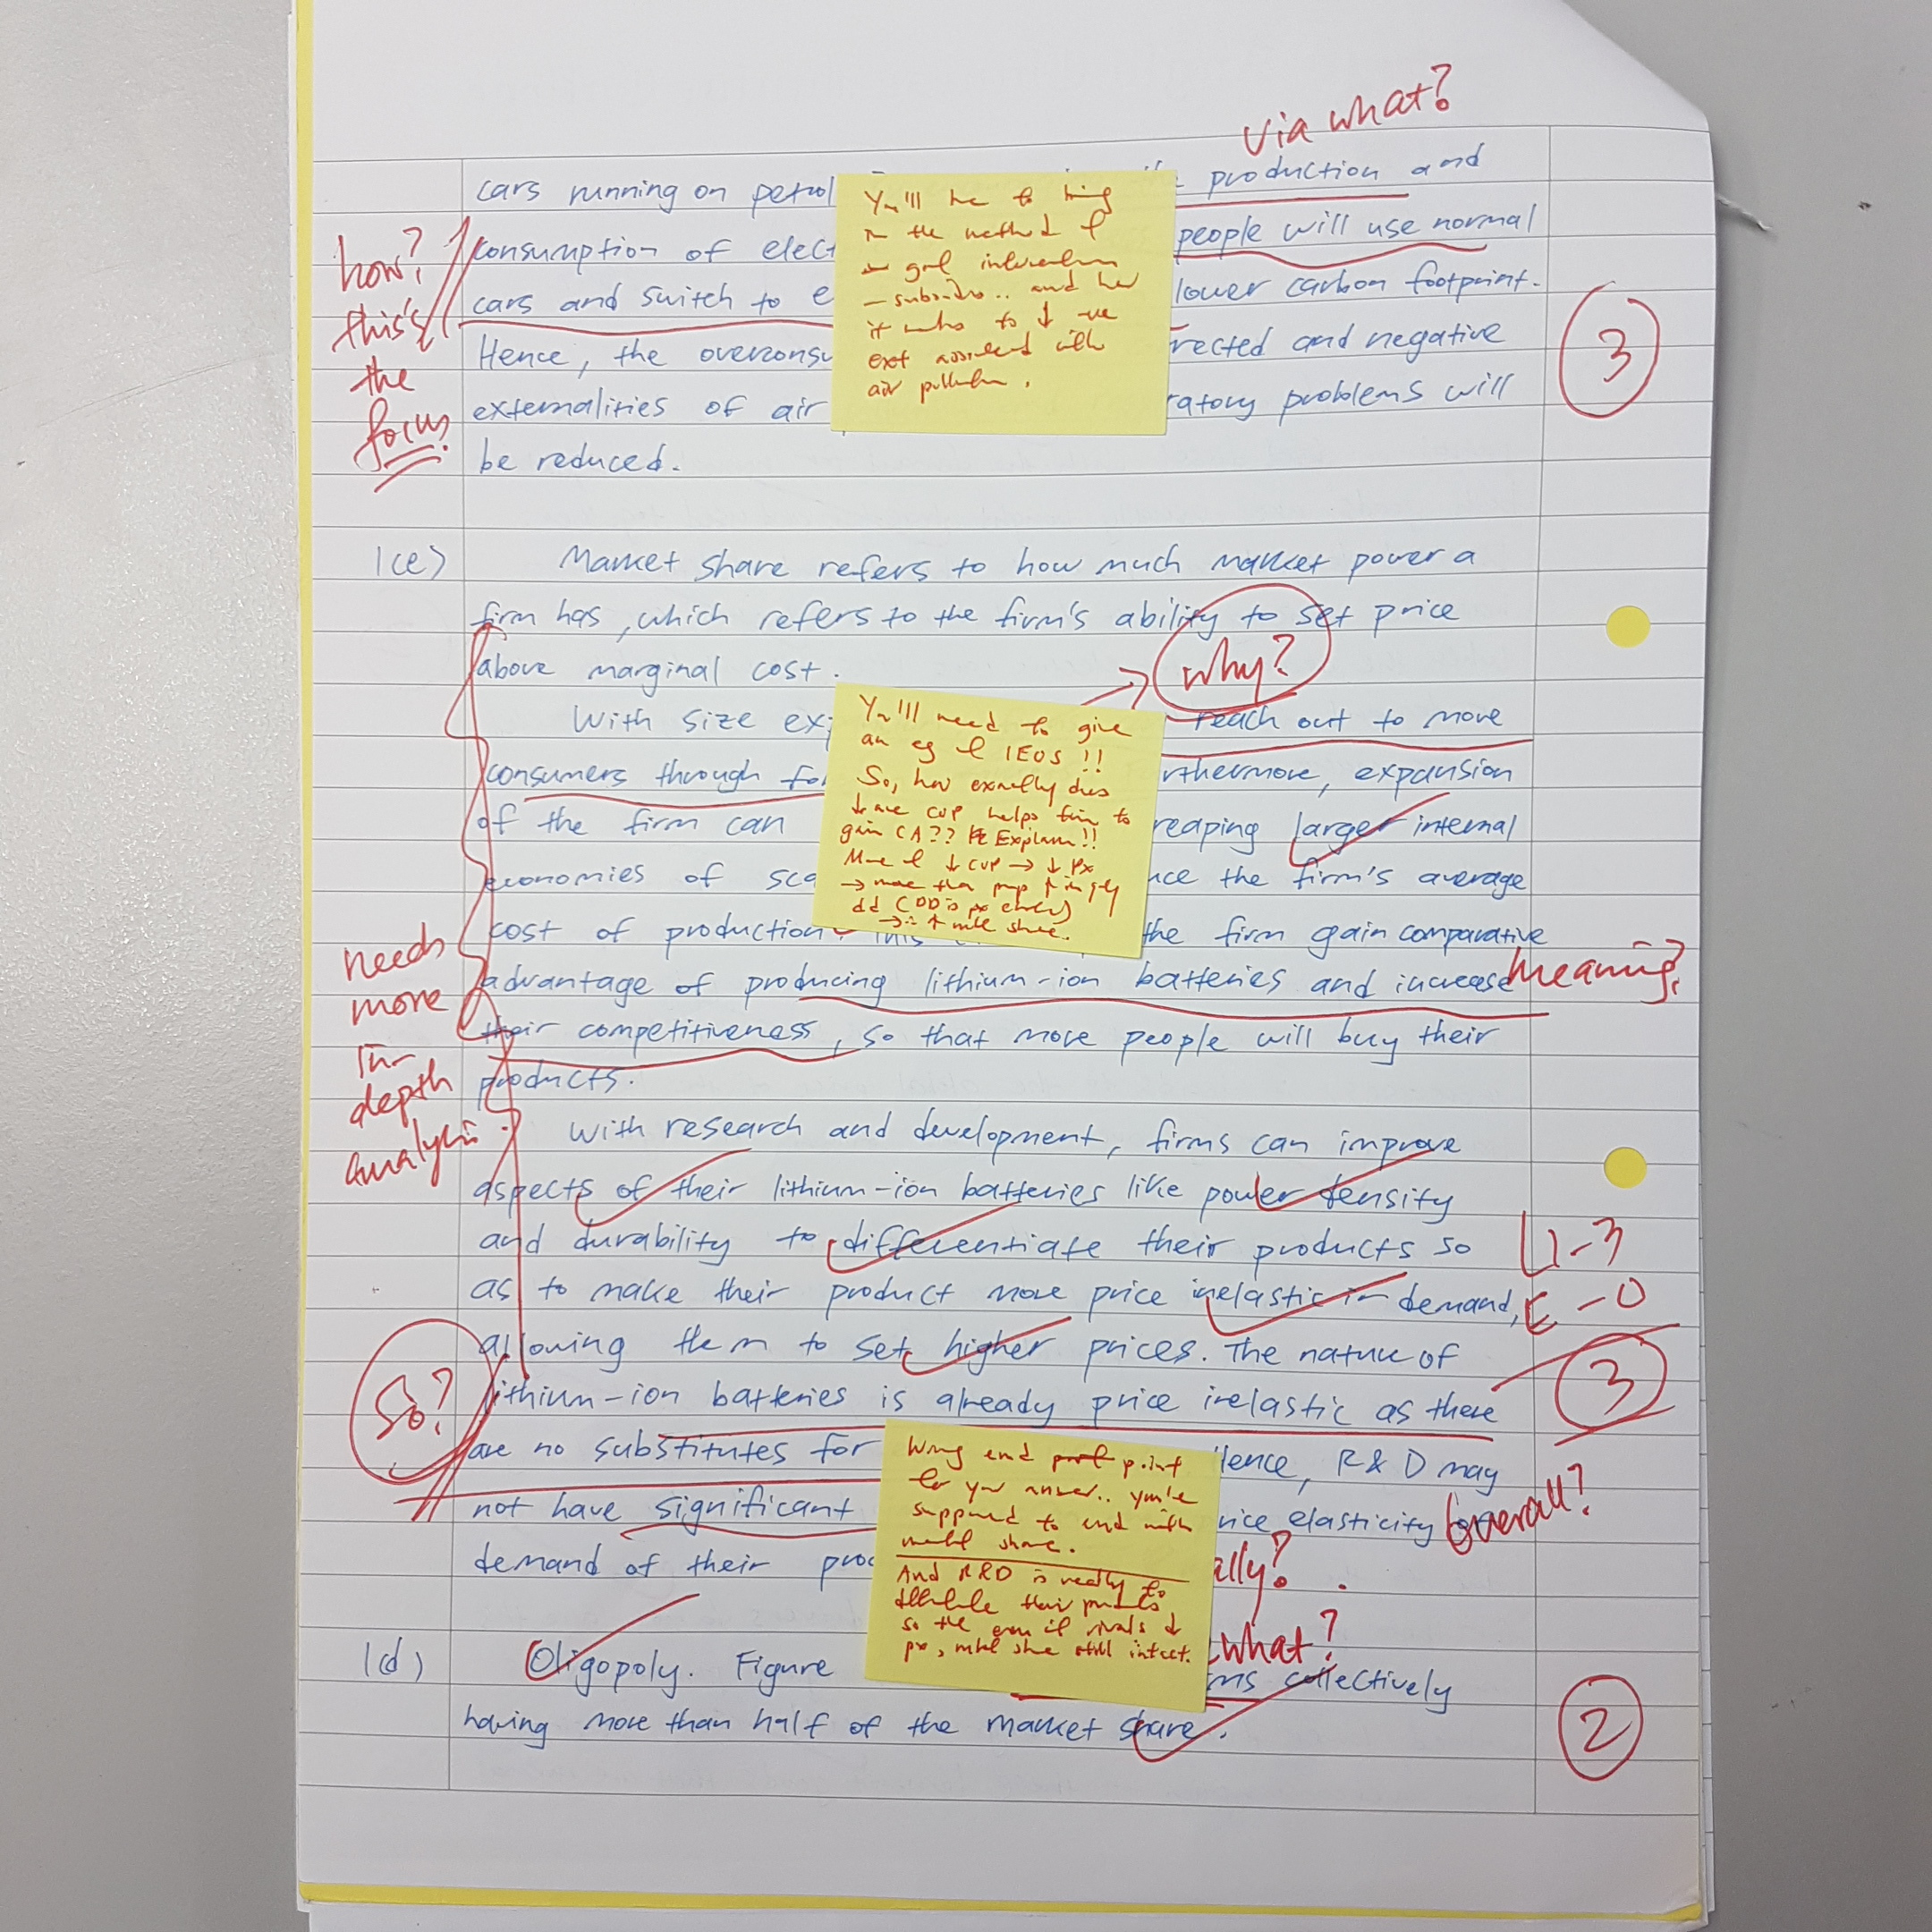 Scripts review1.jpg